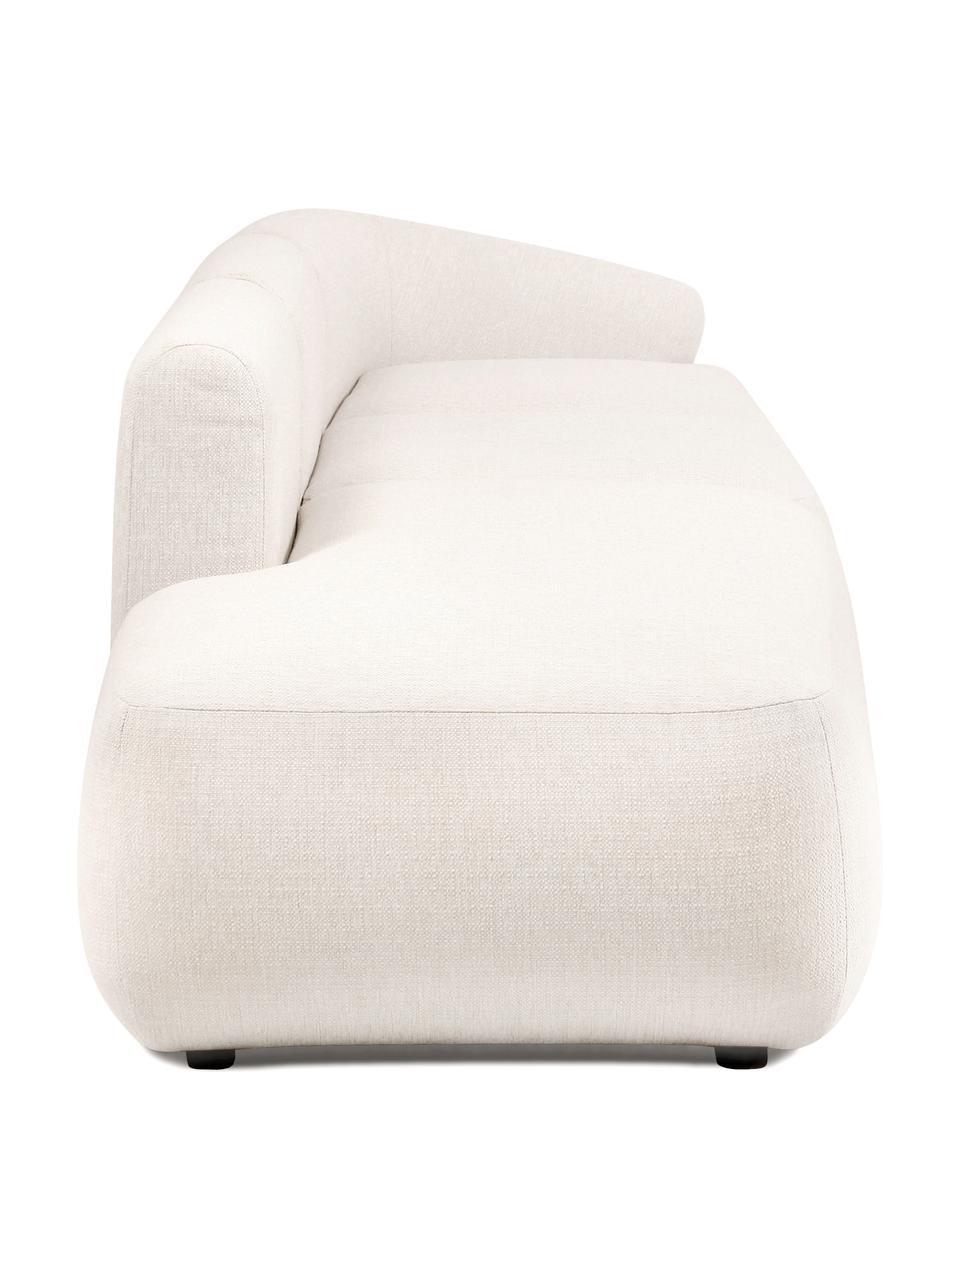 Modulaire chaise longue Sofia, beige, Bekleding: 100% polypropyleen, Frame: massief grenenhout, spaan, Poten: kunststof, Geweven stof beige, B 340 x D 95 cm